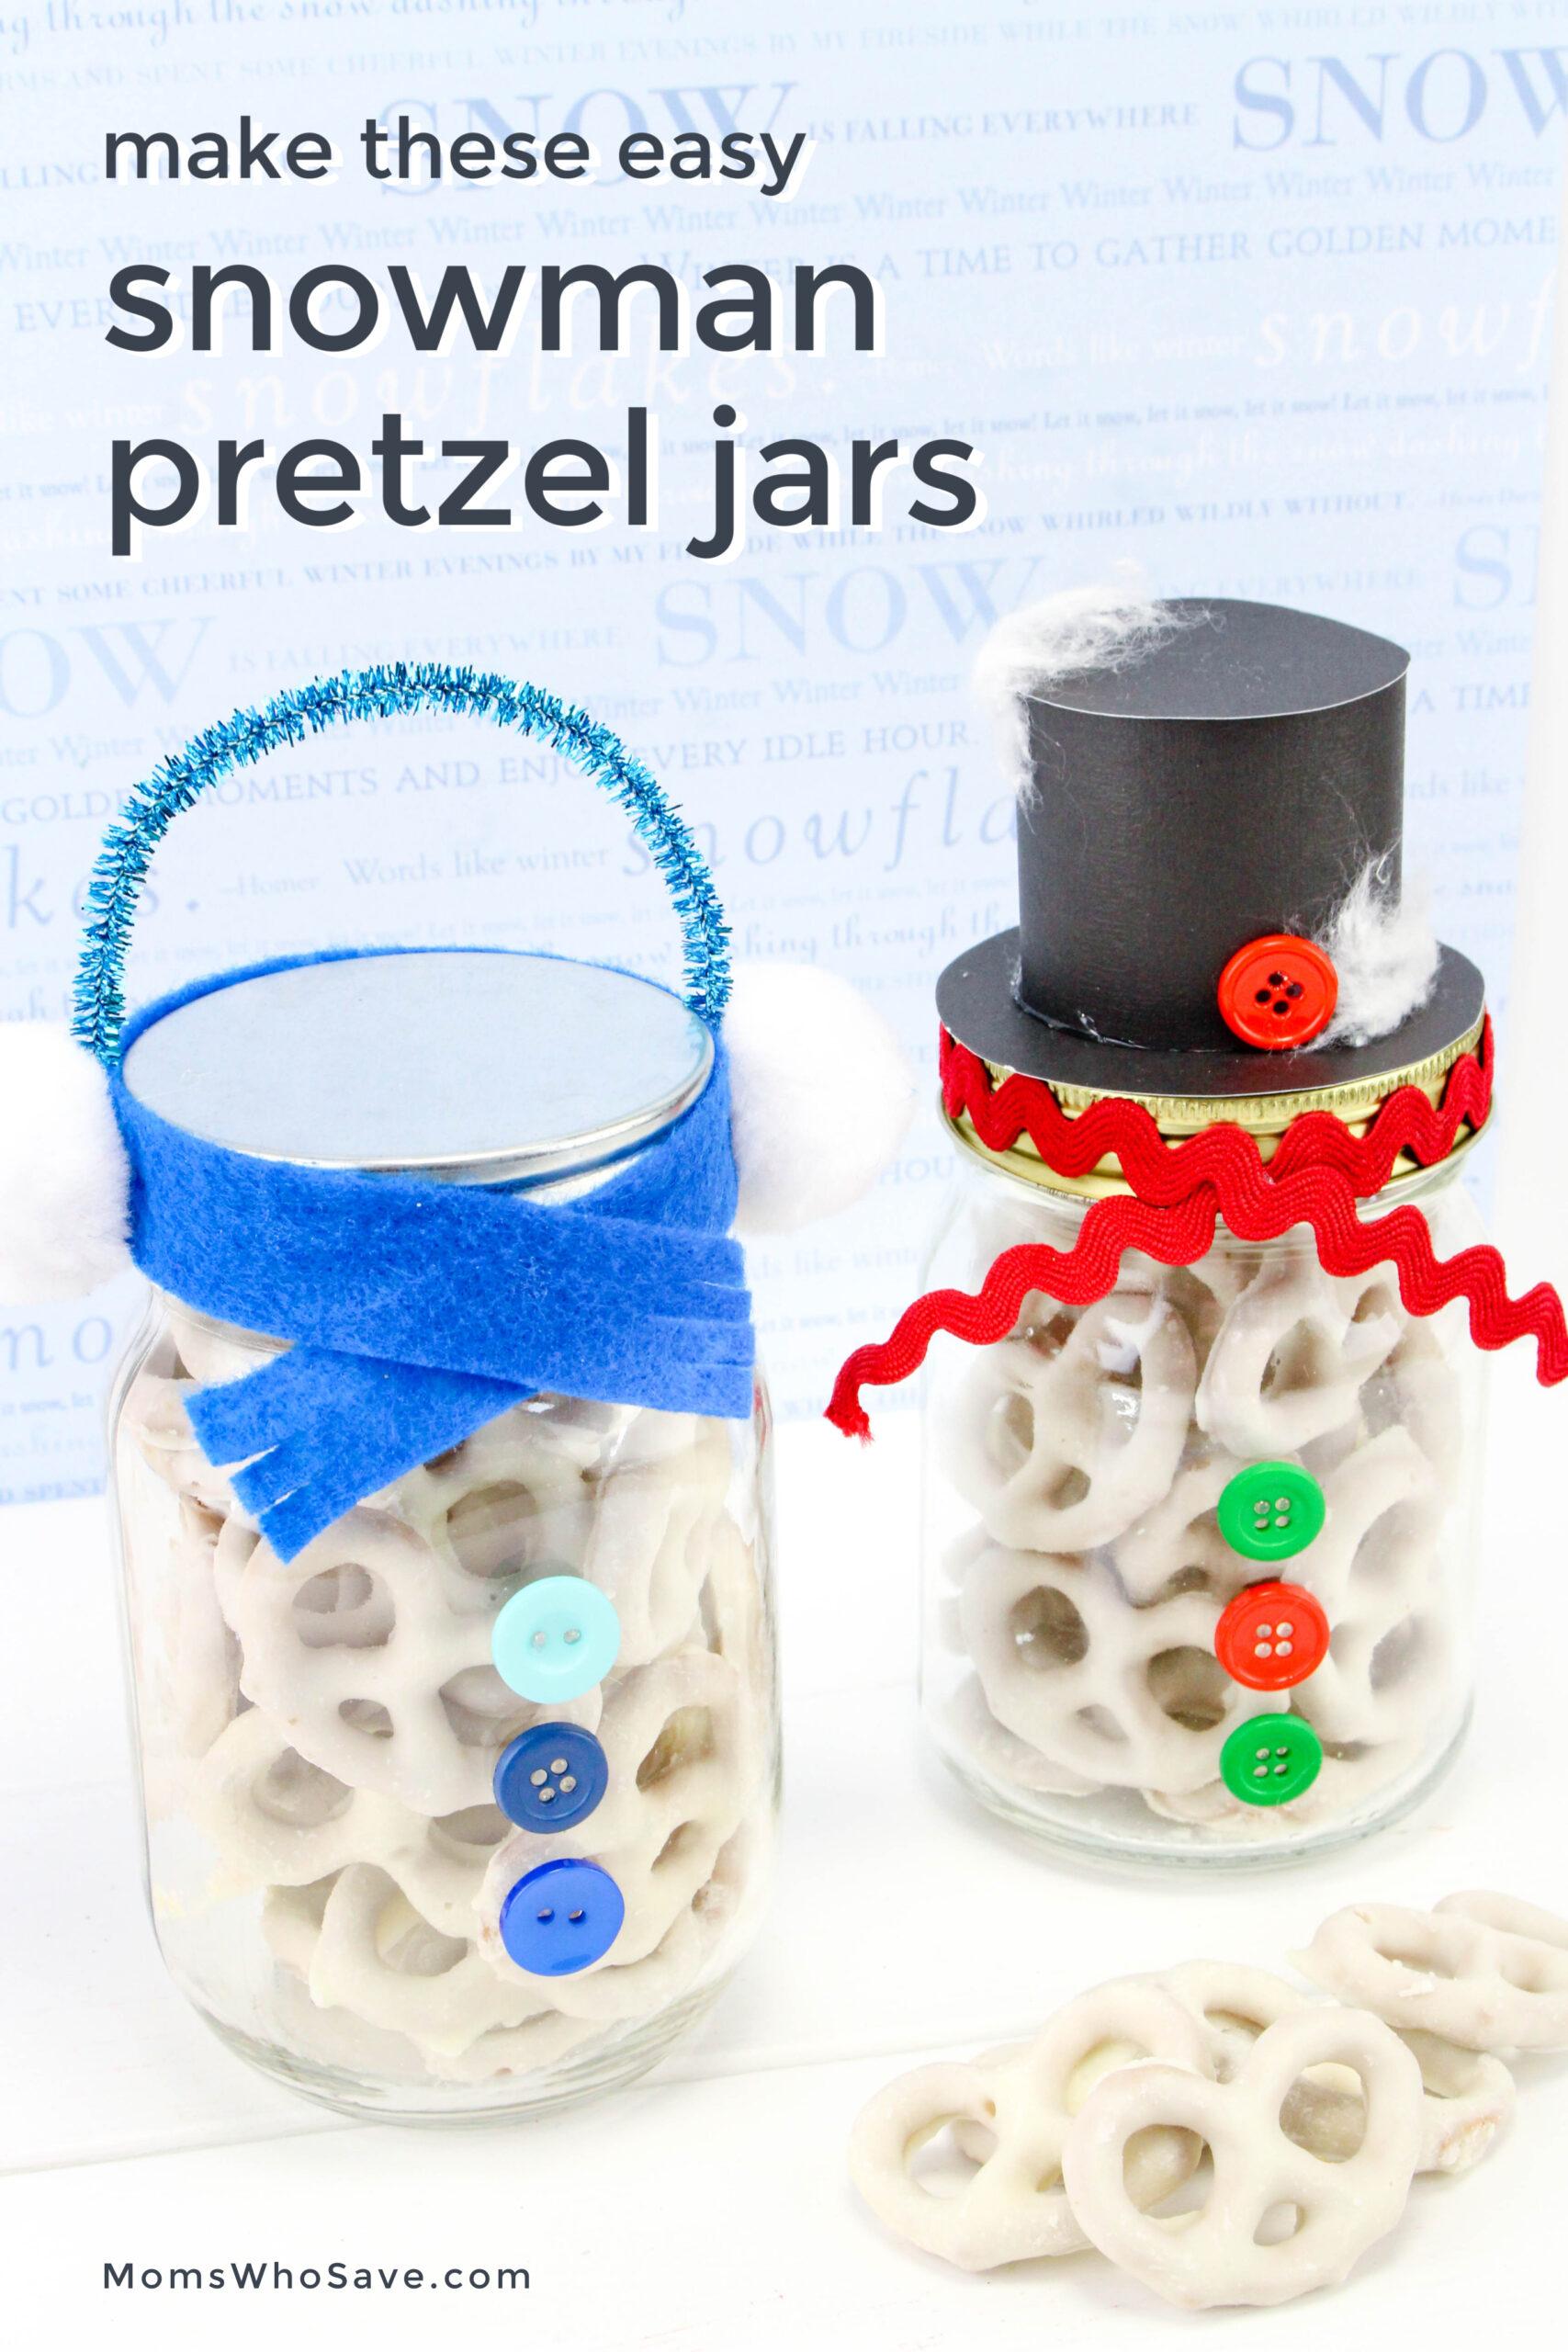 snowman pretzel jars